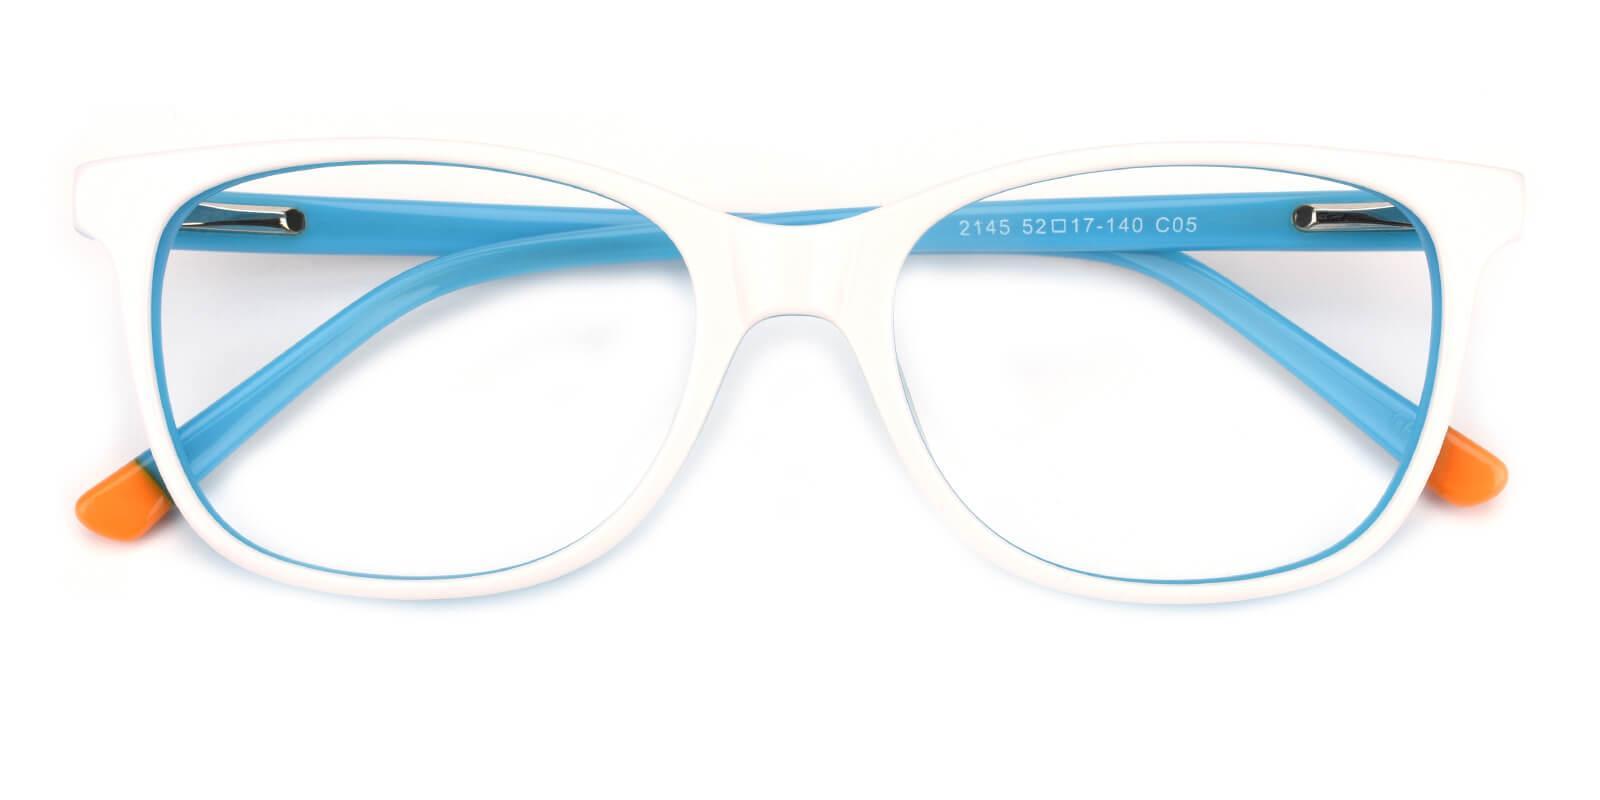 Sandwich-White-Square-Acetate-Eyeglasses-detail